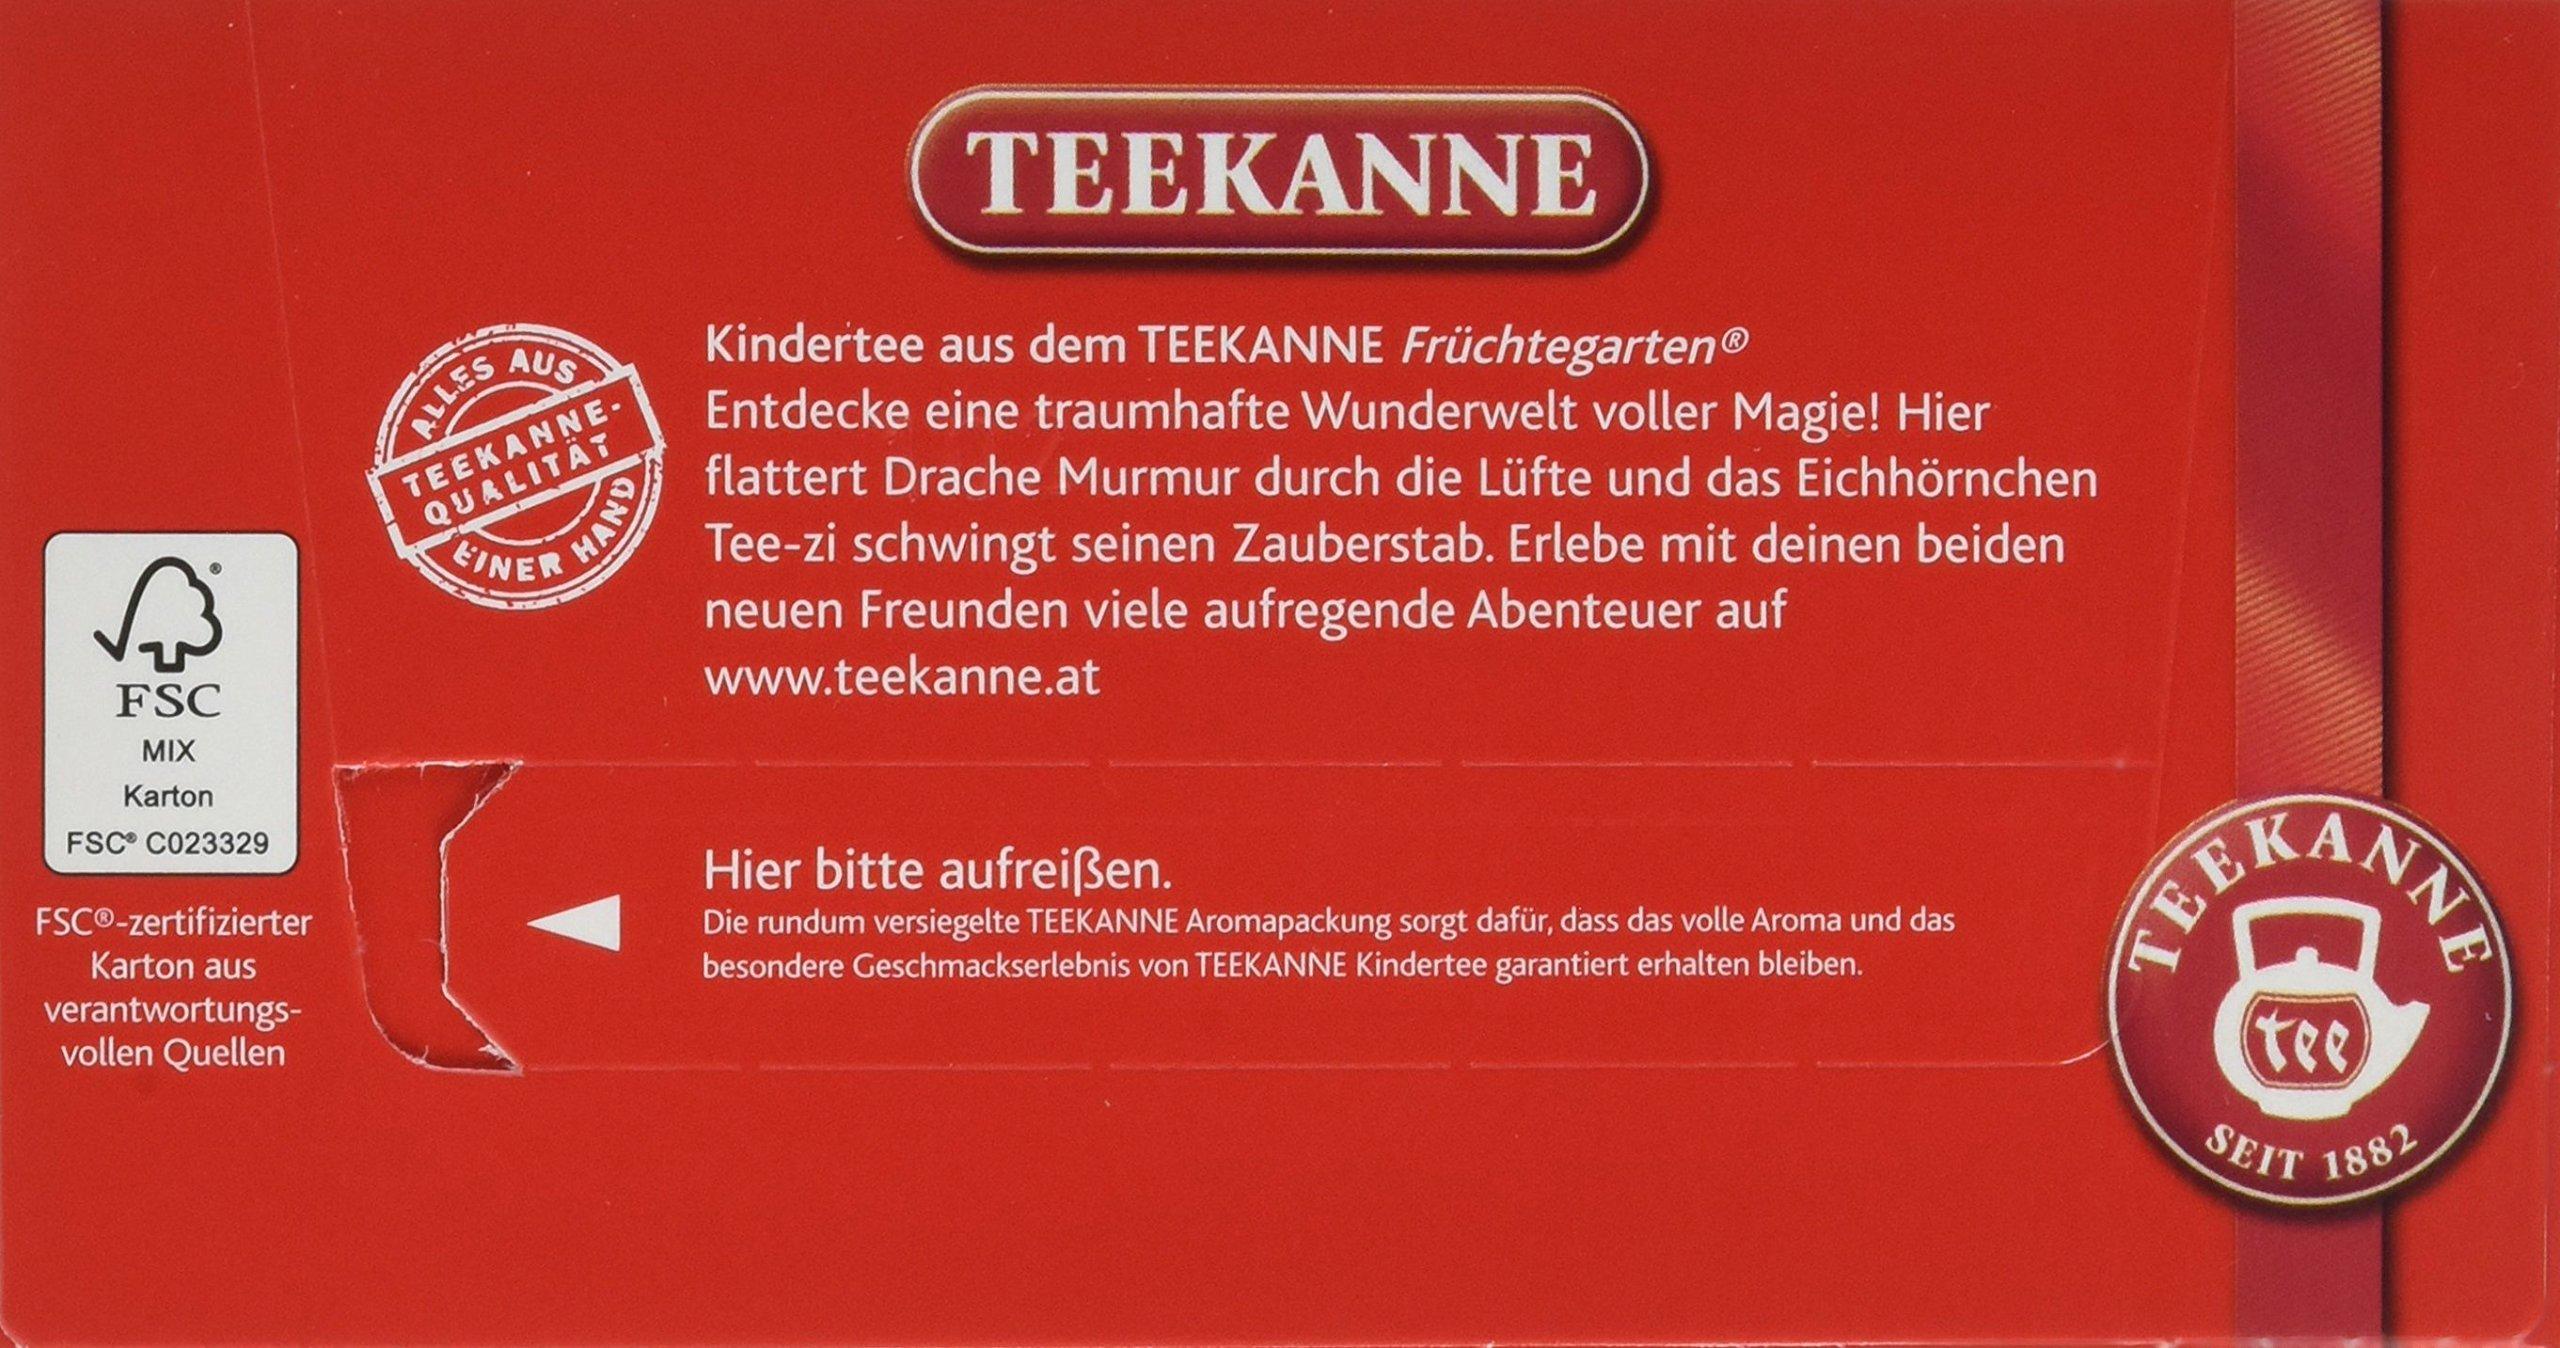 Teekanne-Frchtegarten-Kindertee-6er-Pack-6-x-54-g